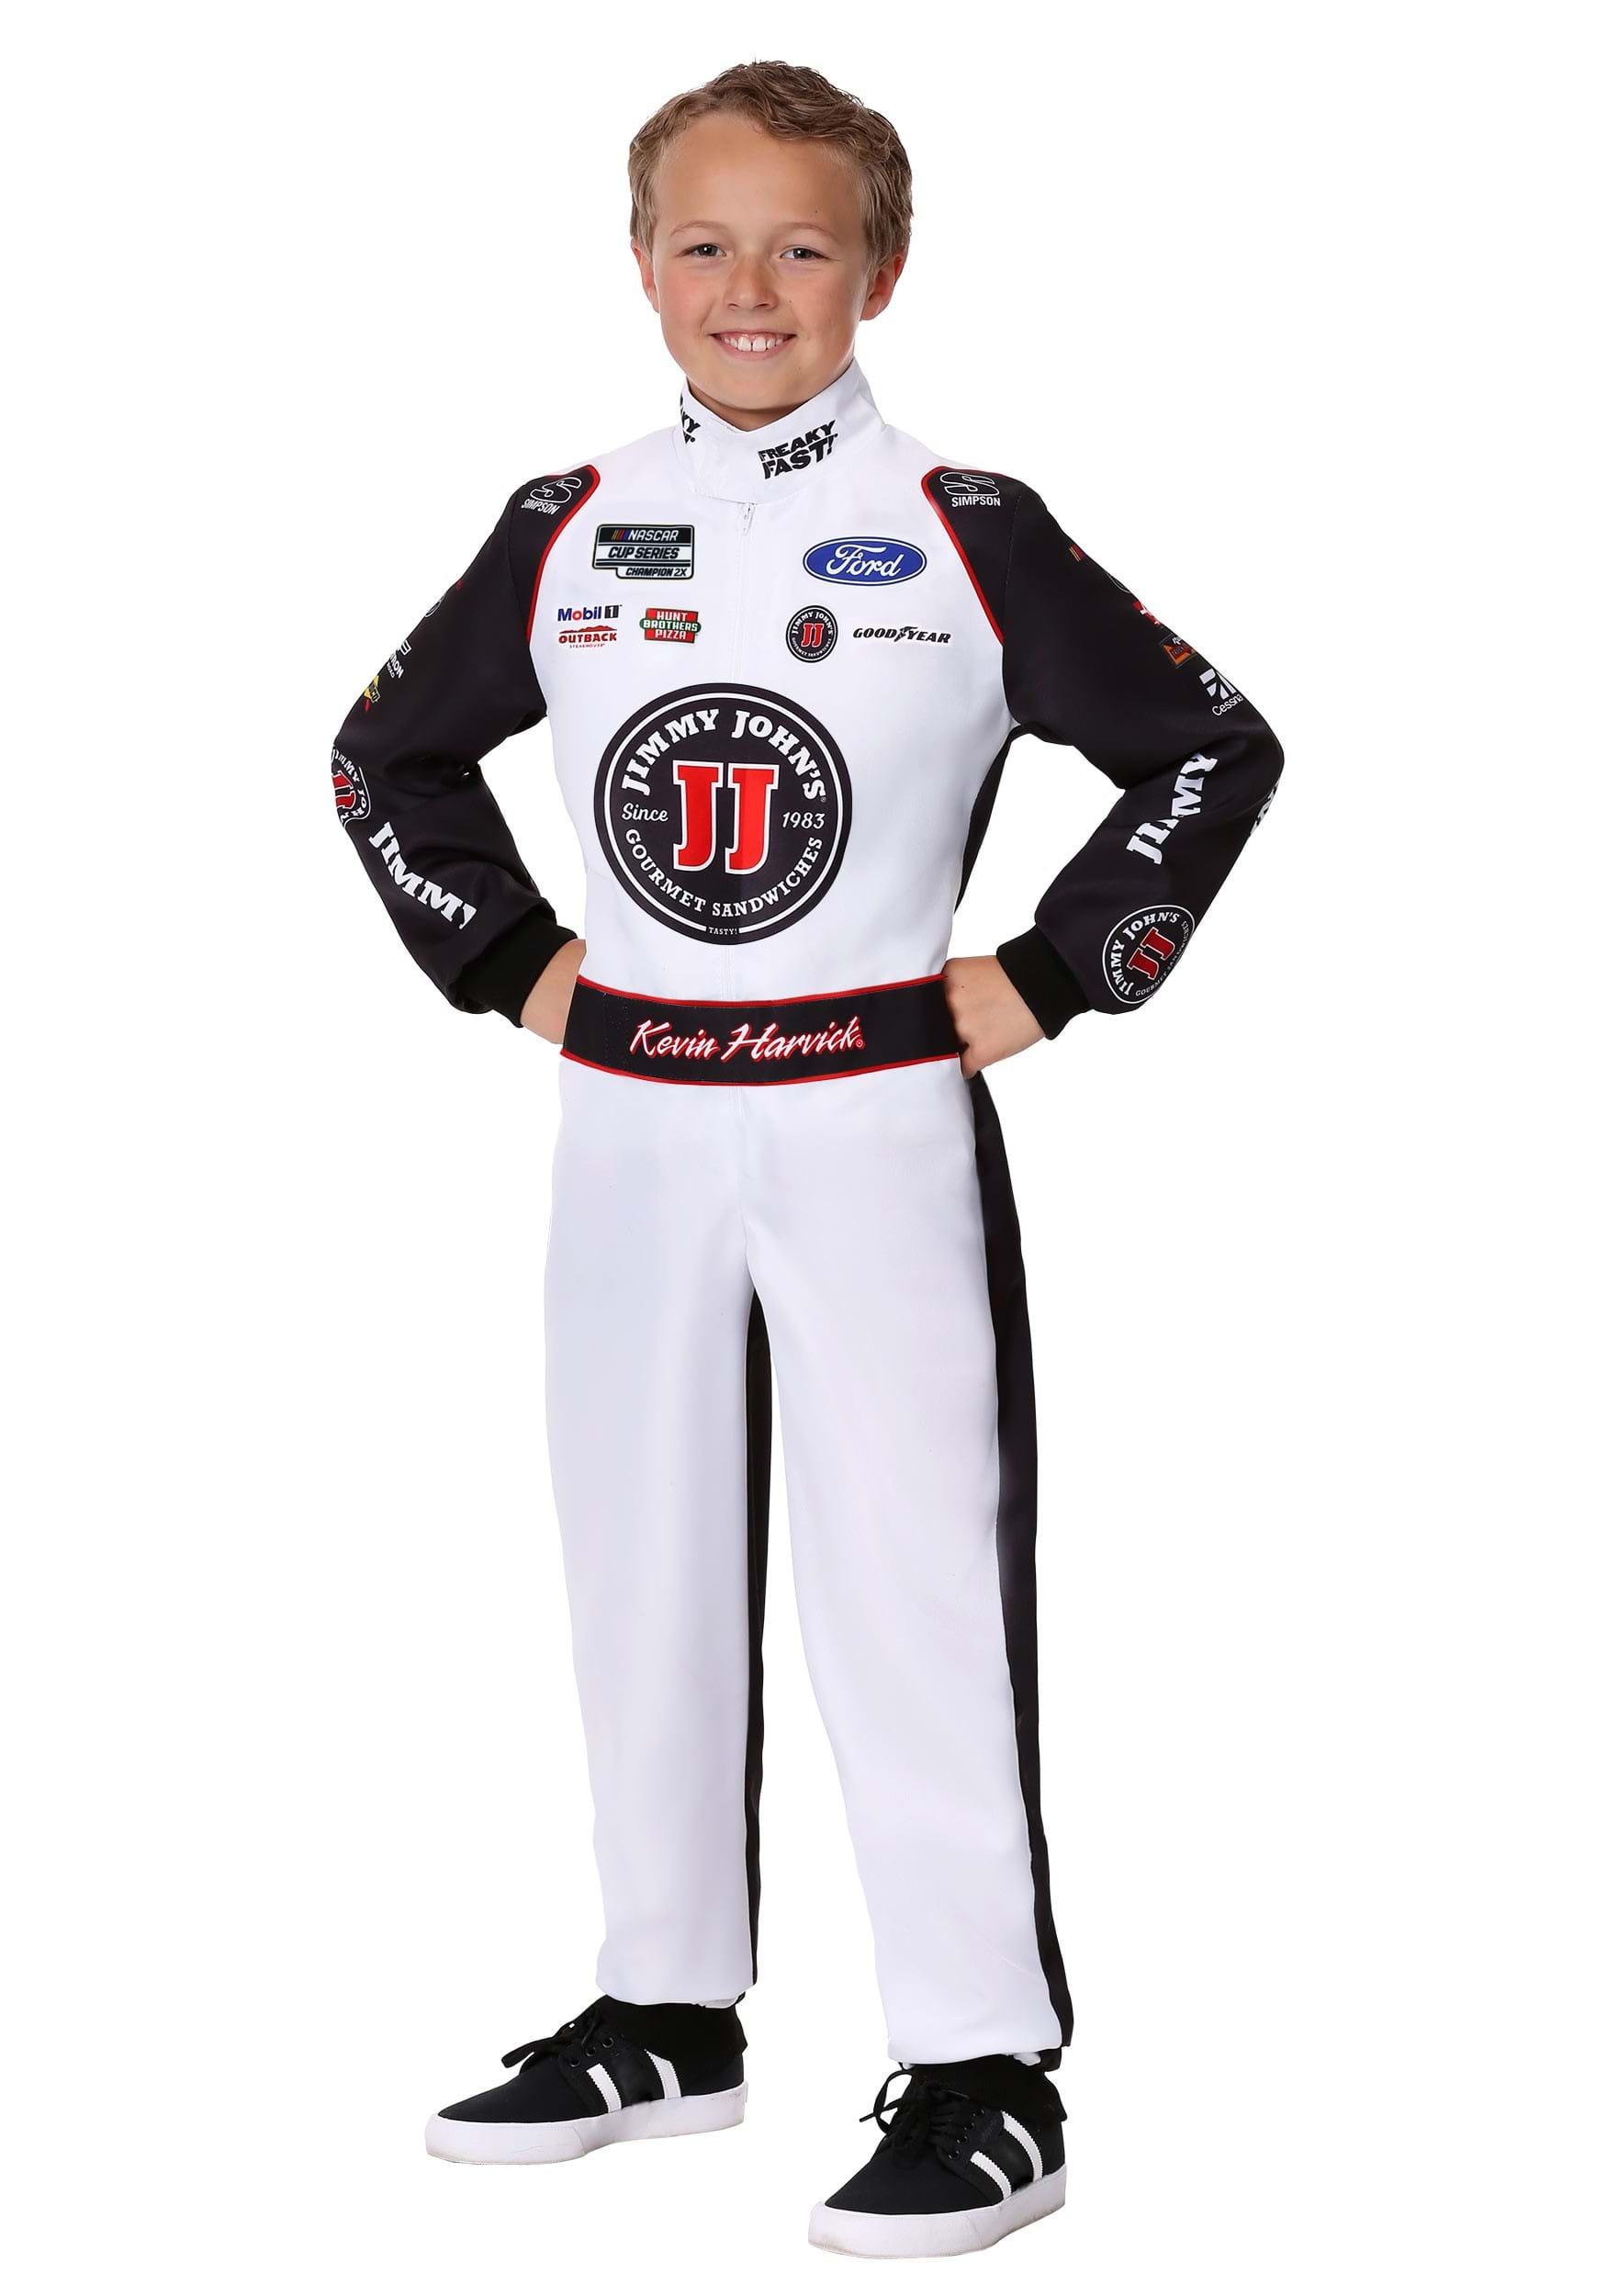 #4 Kevin Harvick(R) Jimmy John's Uniform Costume for a Child